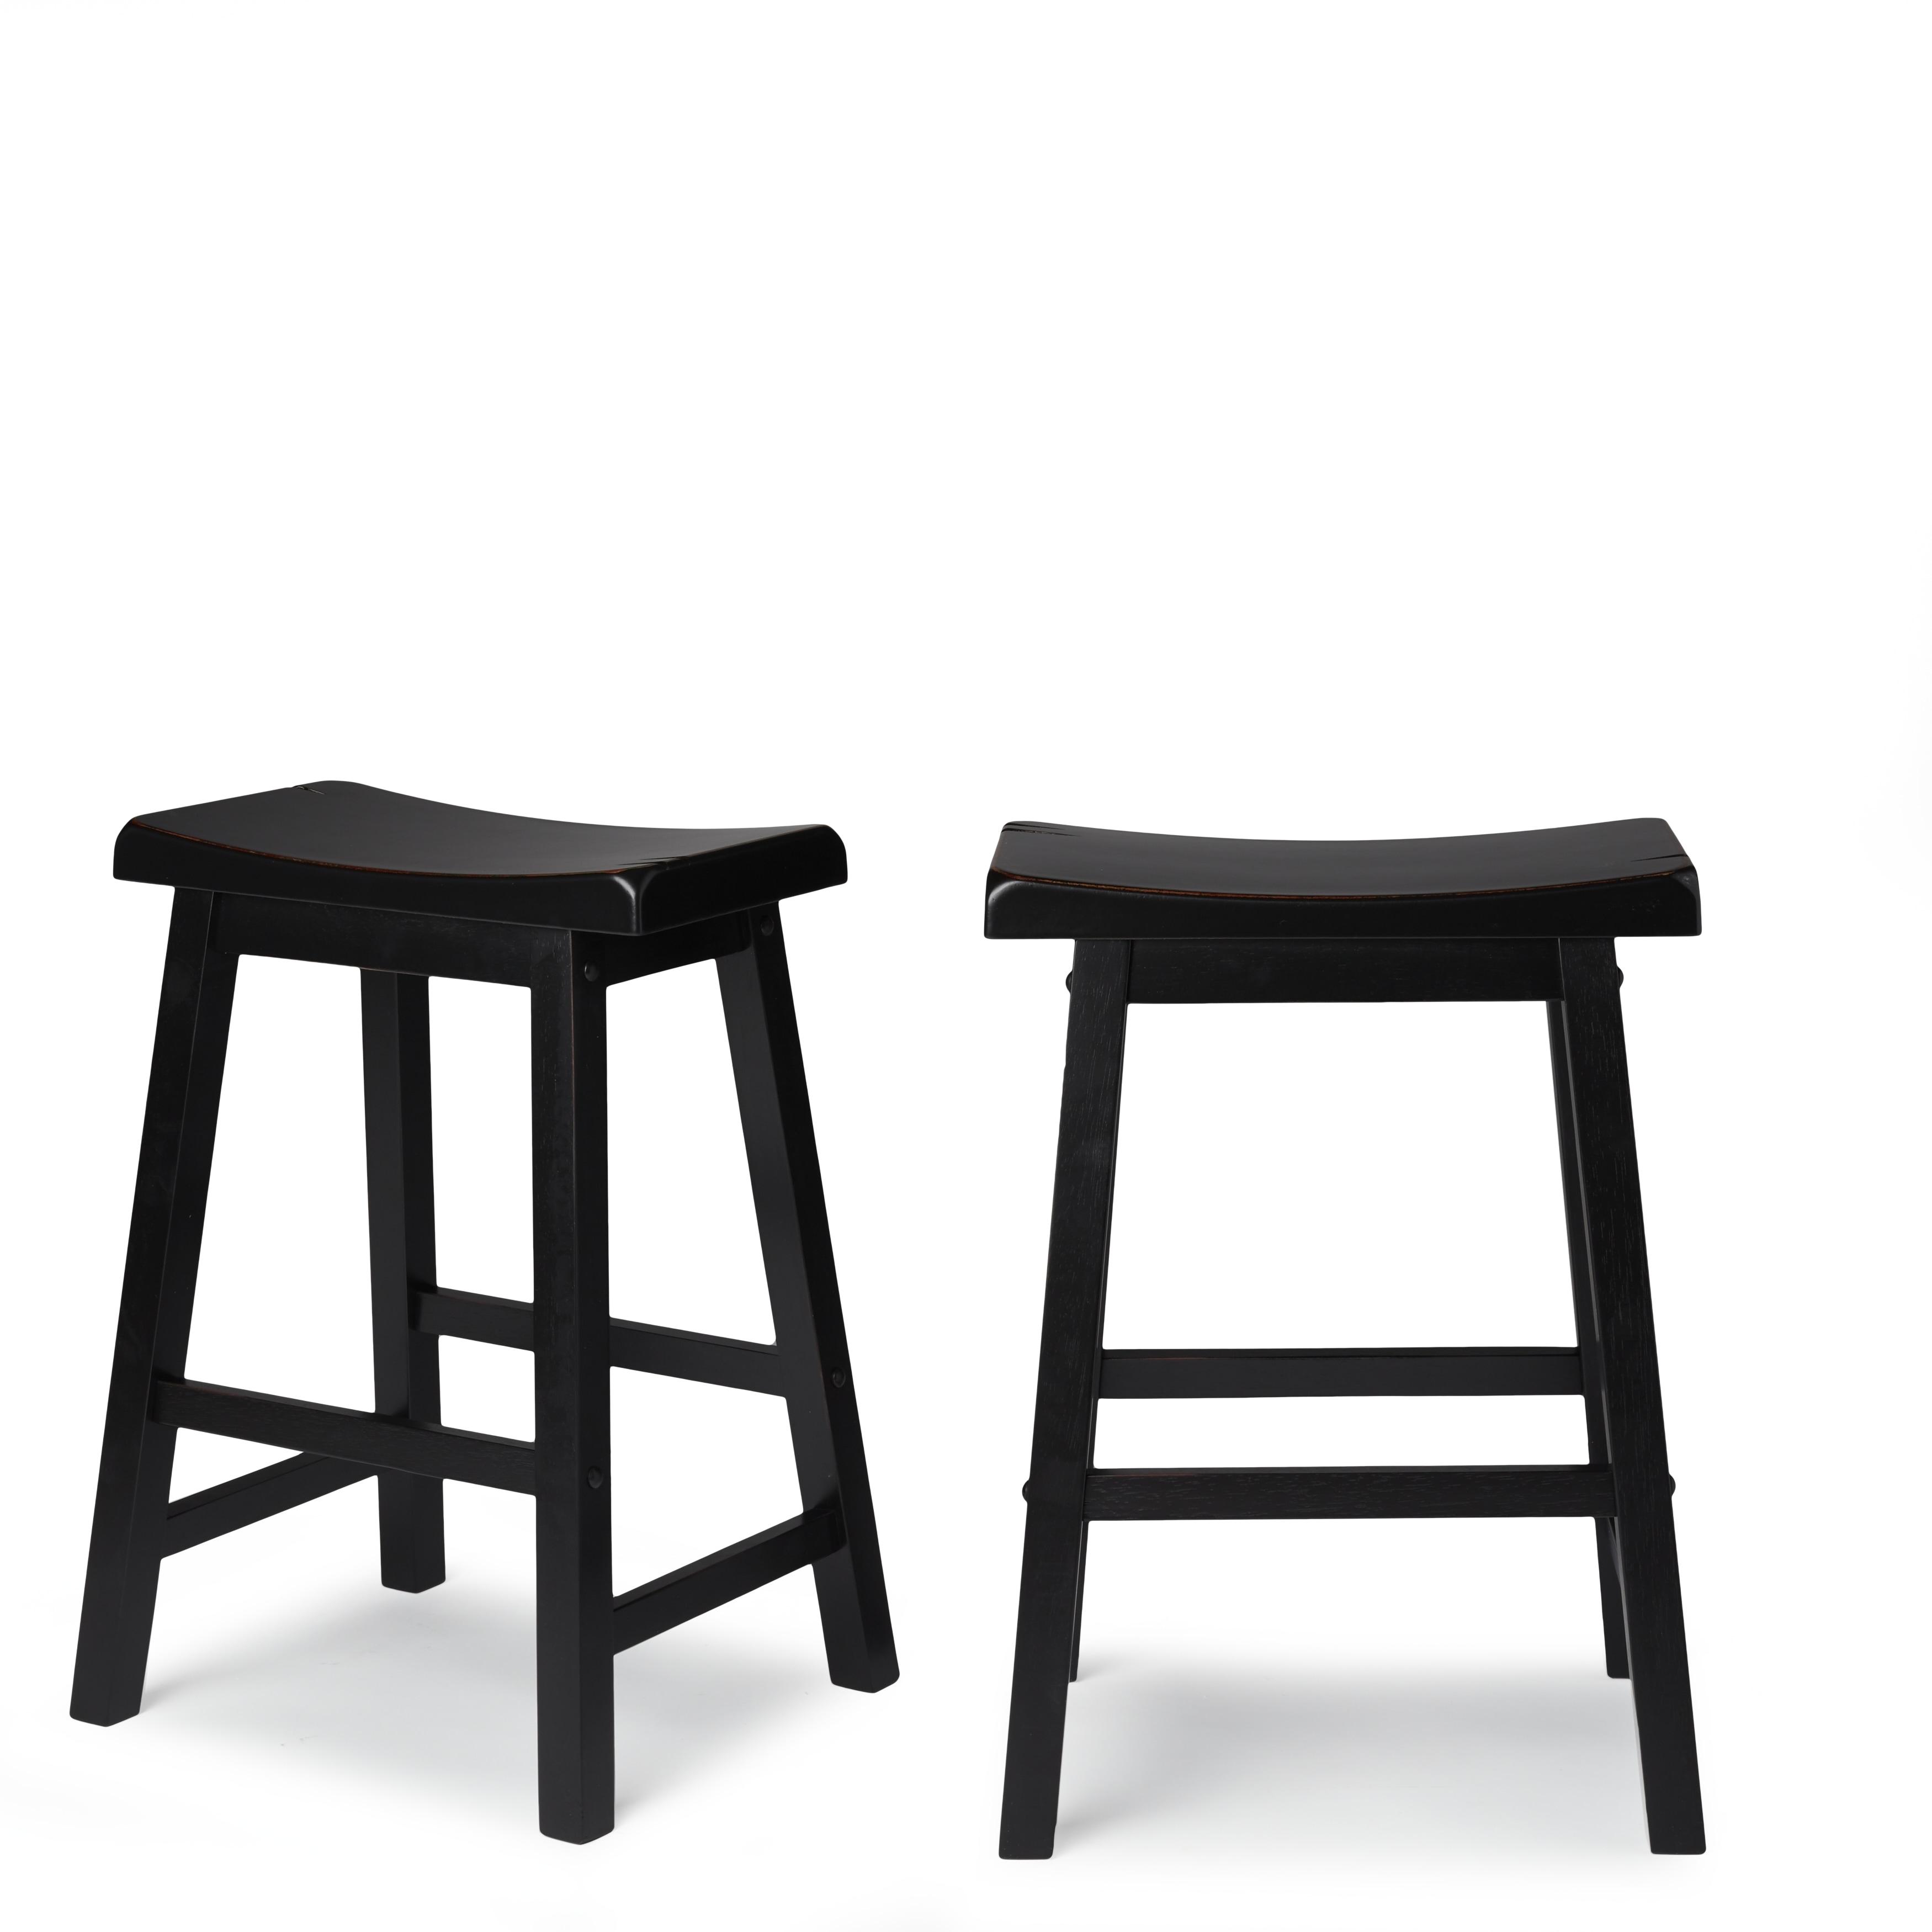 salvador saddle back 24 inch counter height backless stool set of 2 by inspire ebay. Black Bedroom Furniture Sets. Home Design Ideas